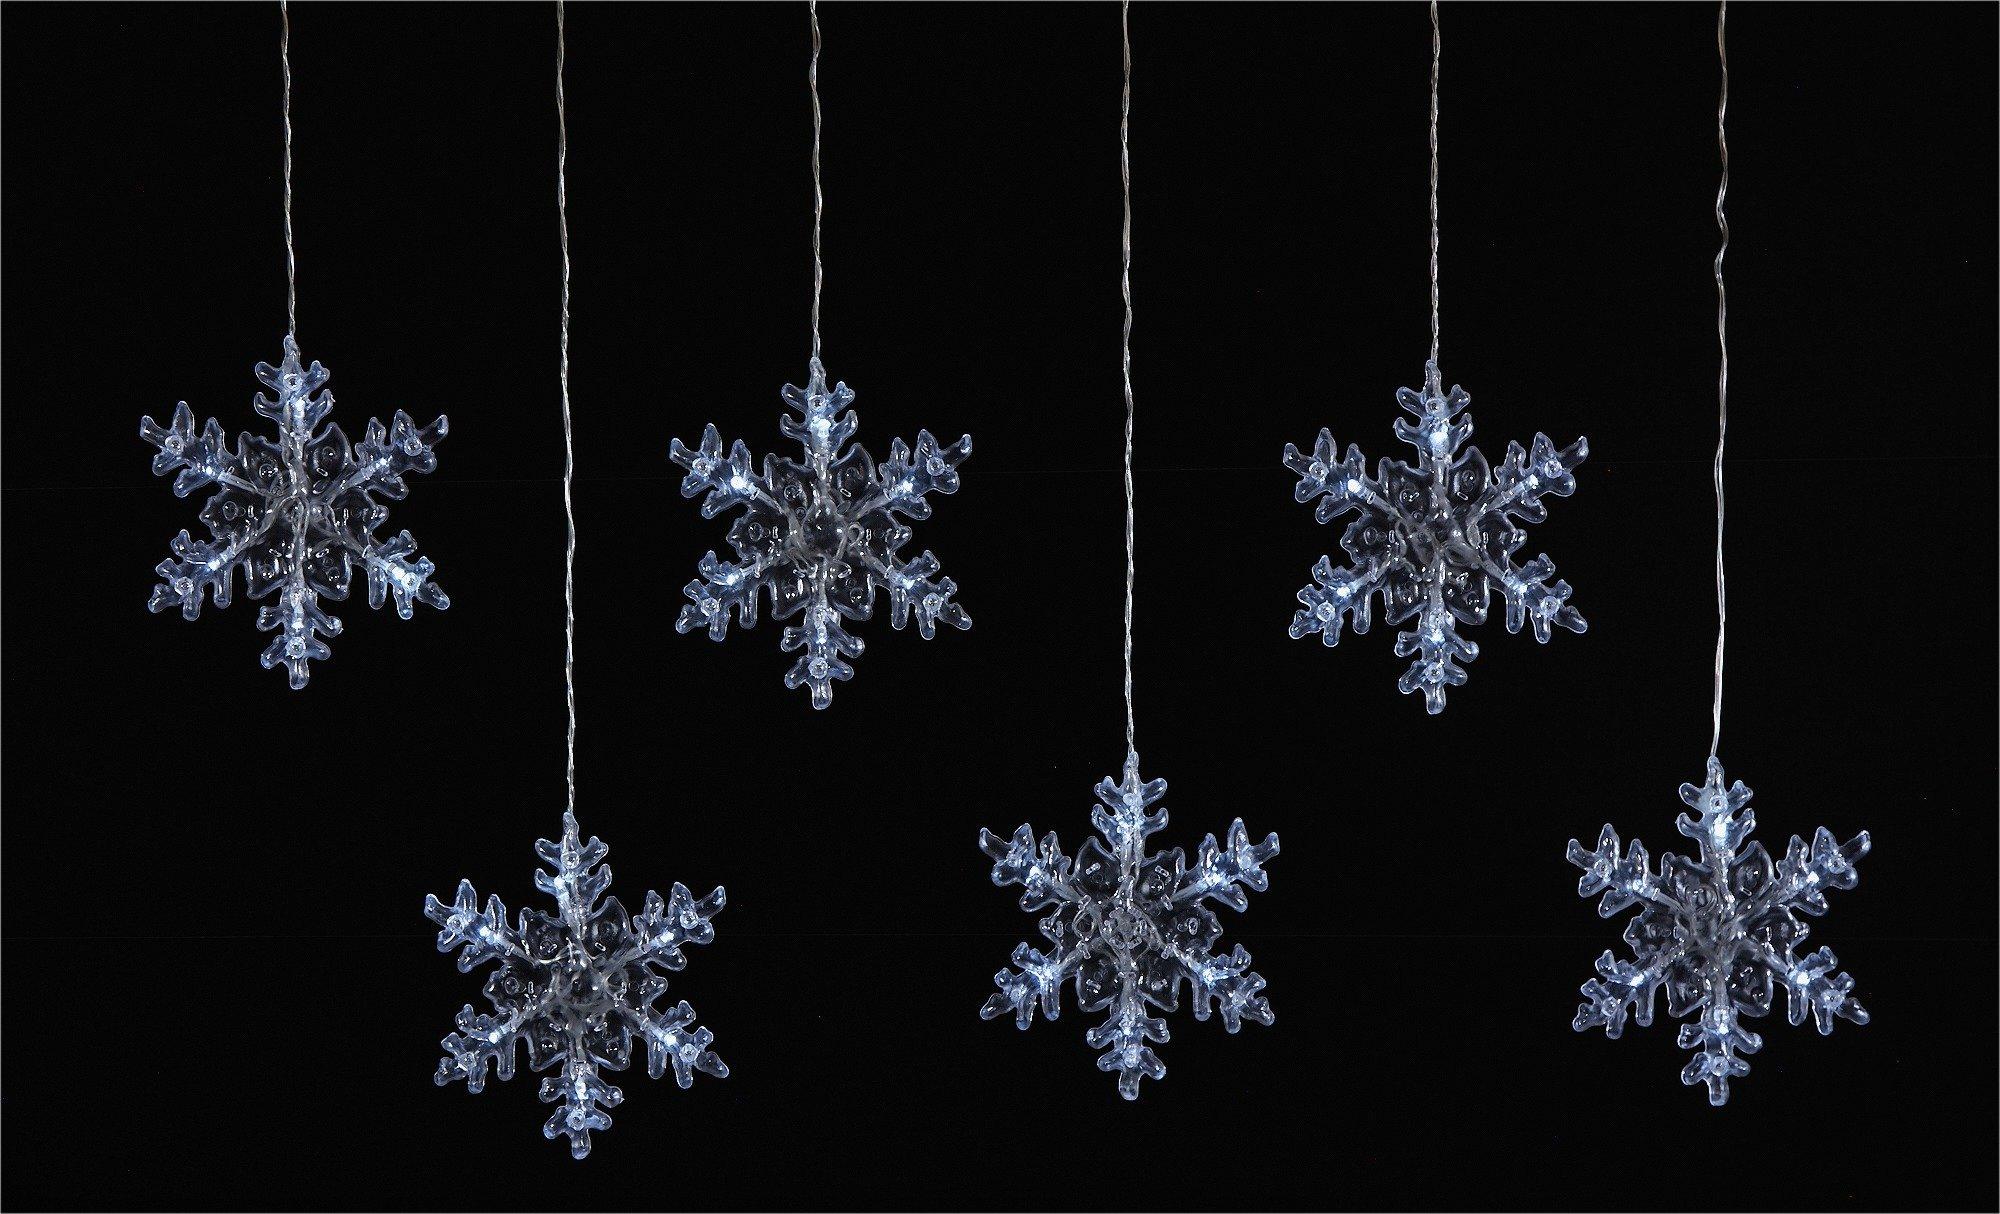 6 Snowflake Window Lights